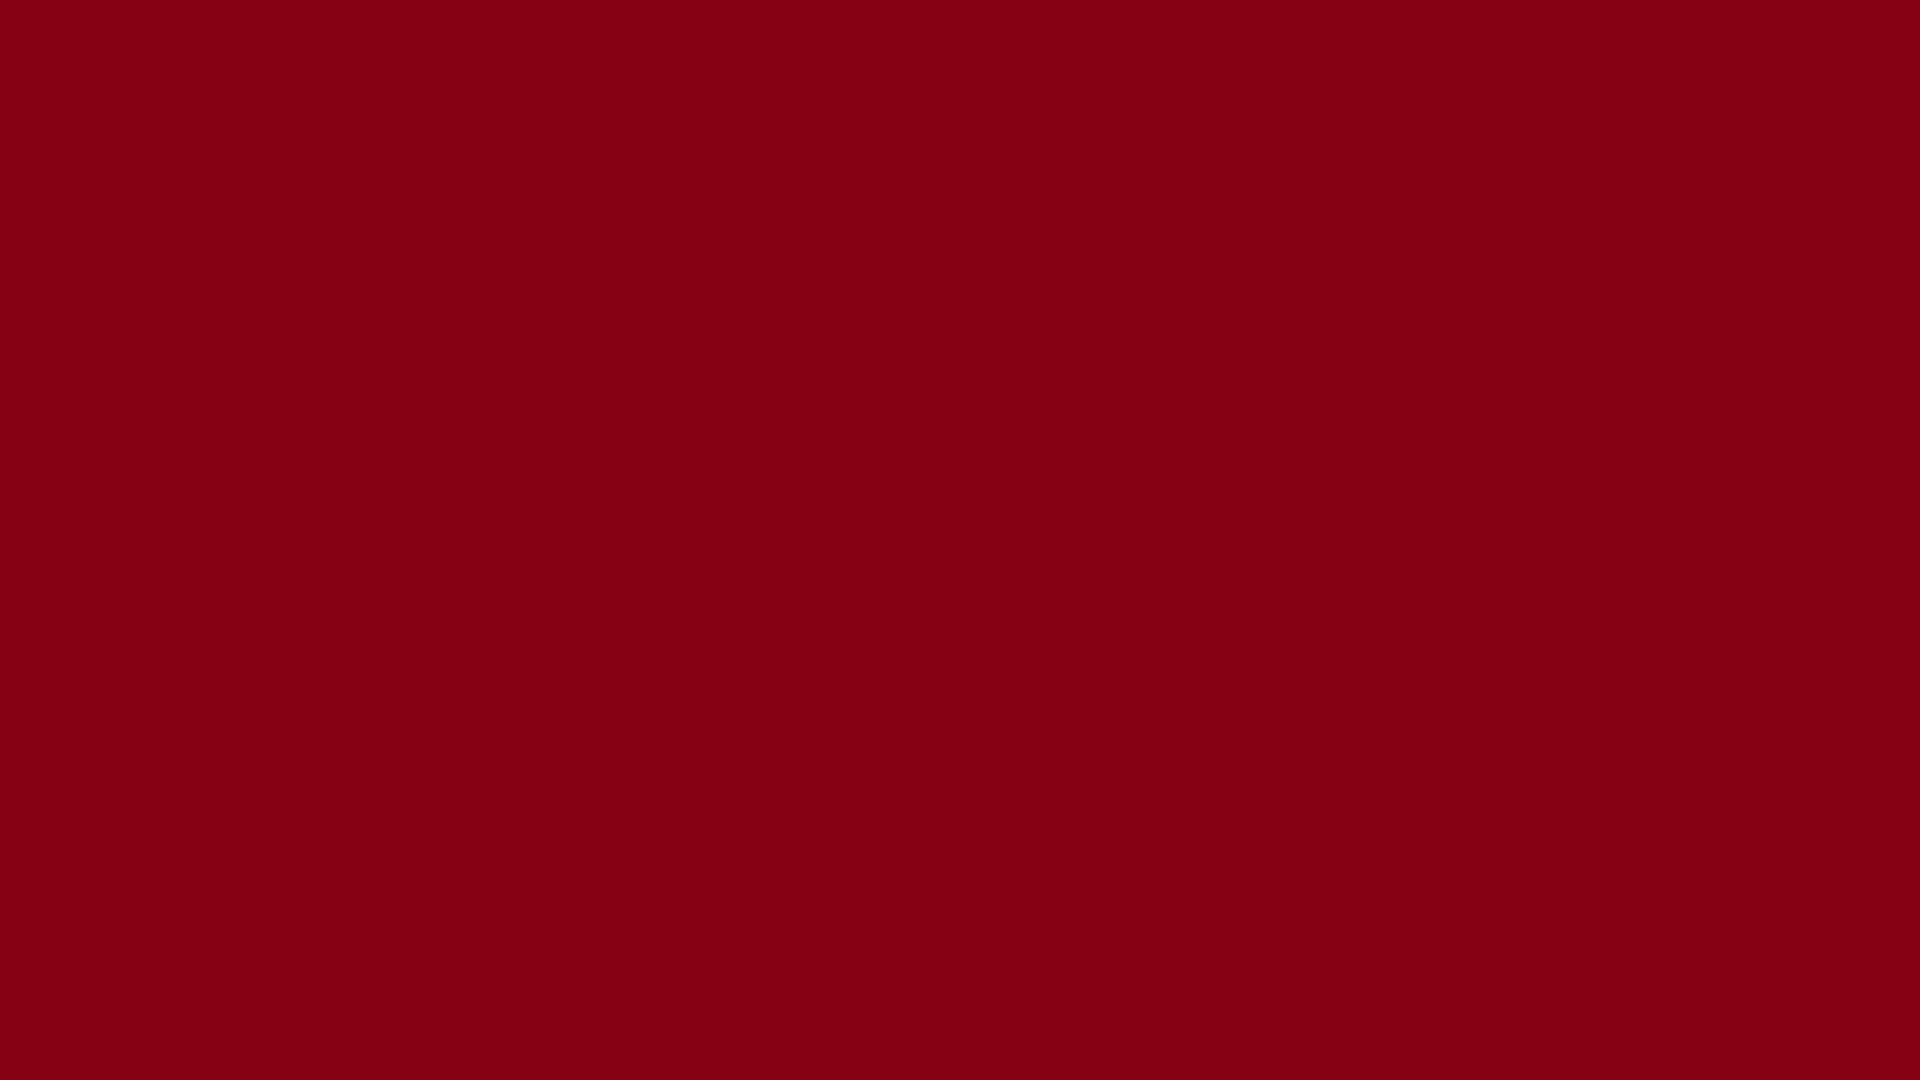 1920x1080 Red Devil Solid Color Background